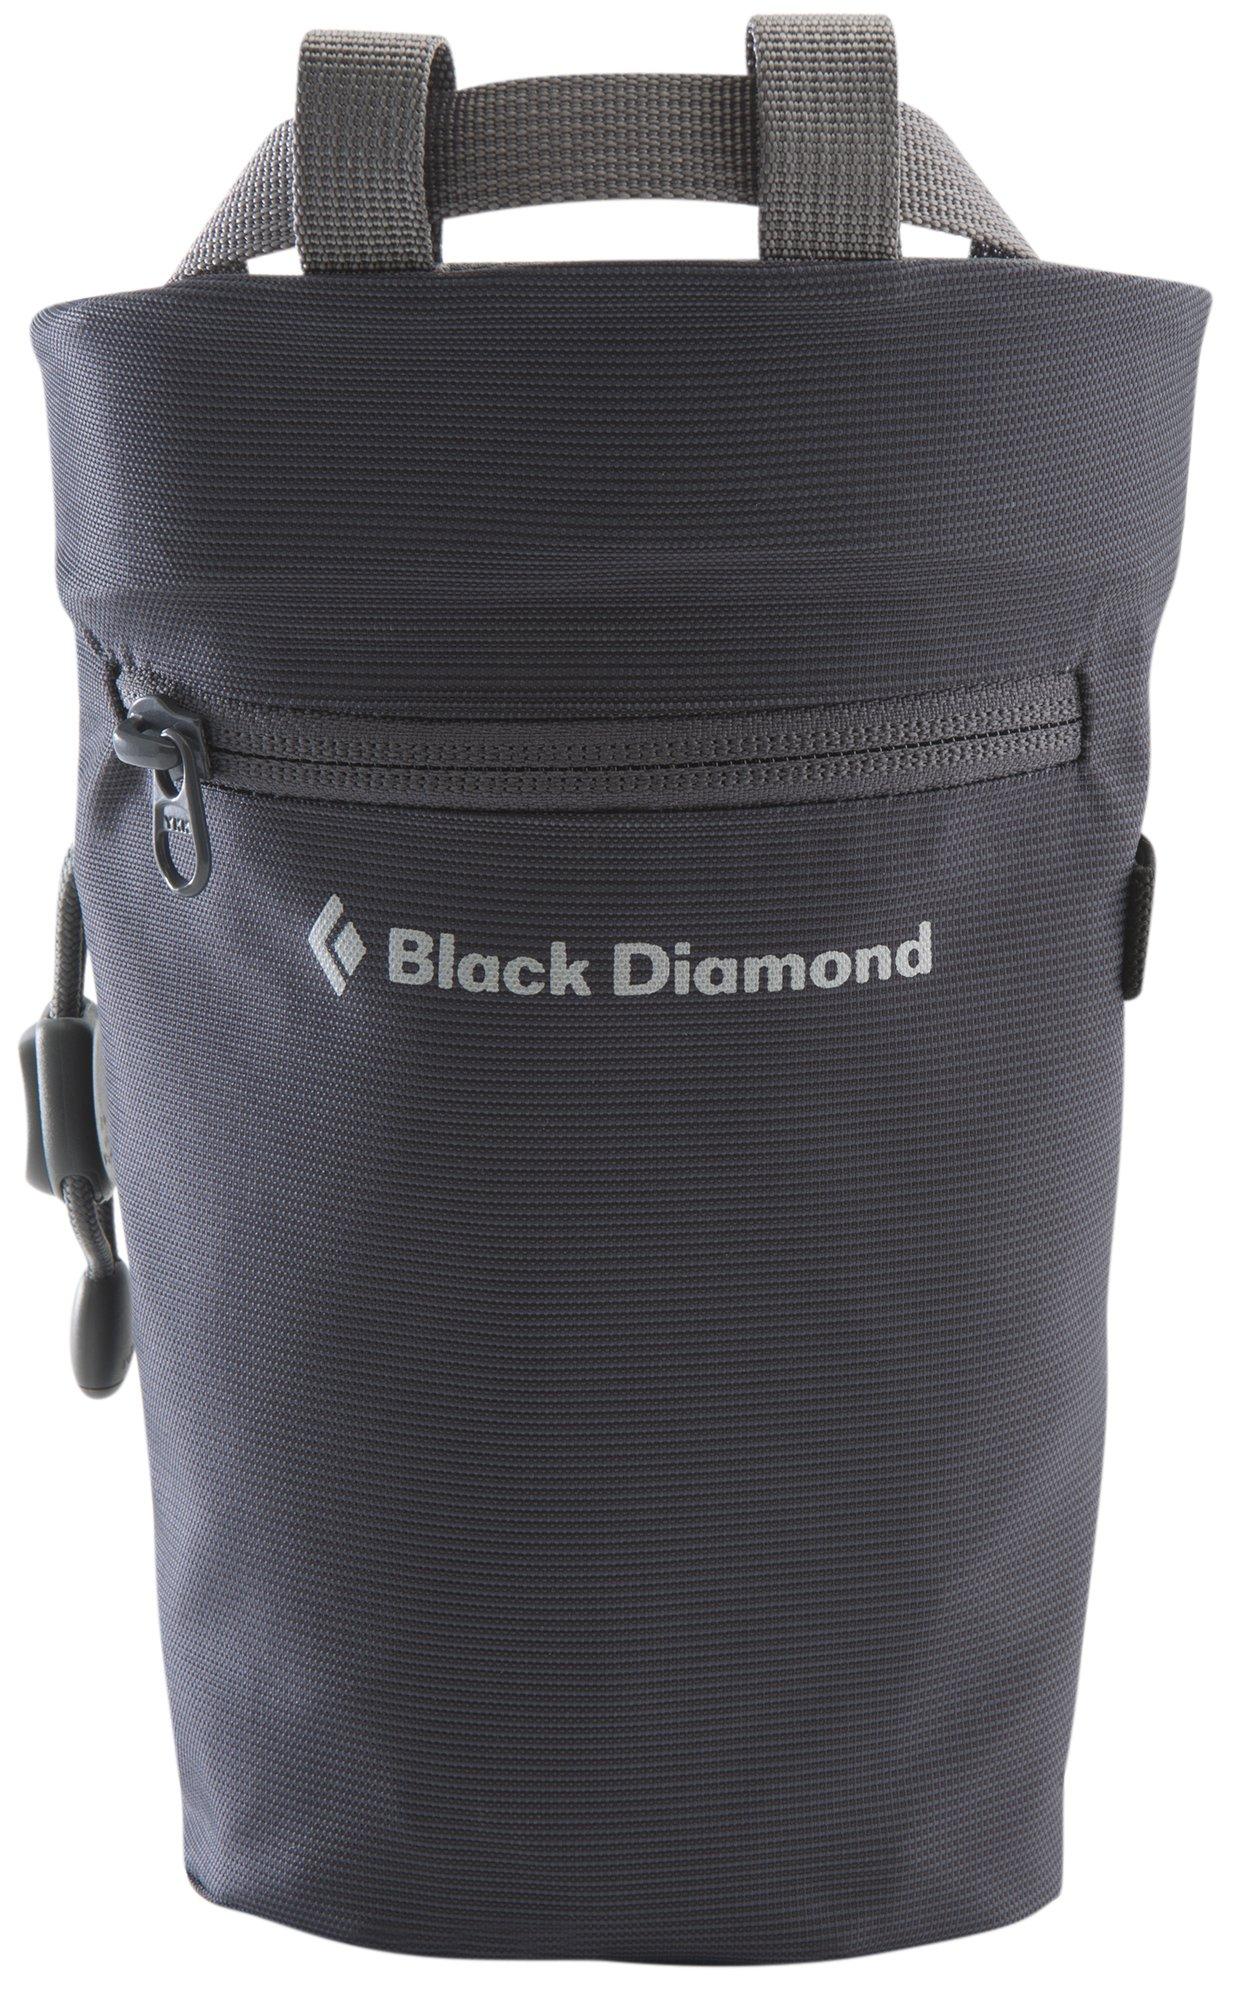 Black Diamond Cult Chalk Bag - Coral Reef Small/Medium